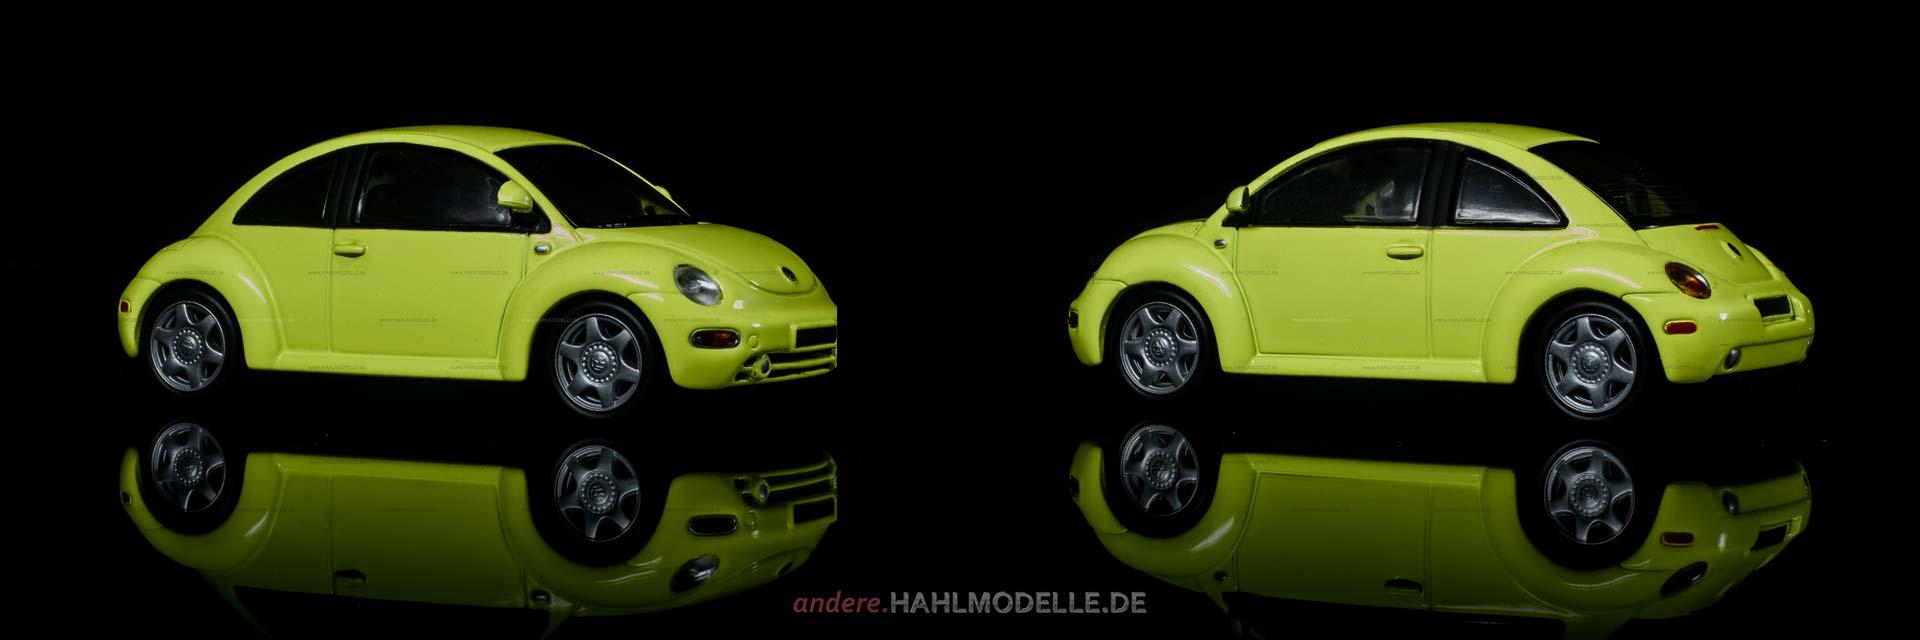 Volkswagen New Beetle (Typ 9c) | Limousine | Ixo (Del Prado Car Collection) | 1:43 | www.andere.hahlmodelle.de